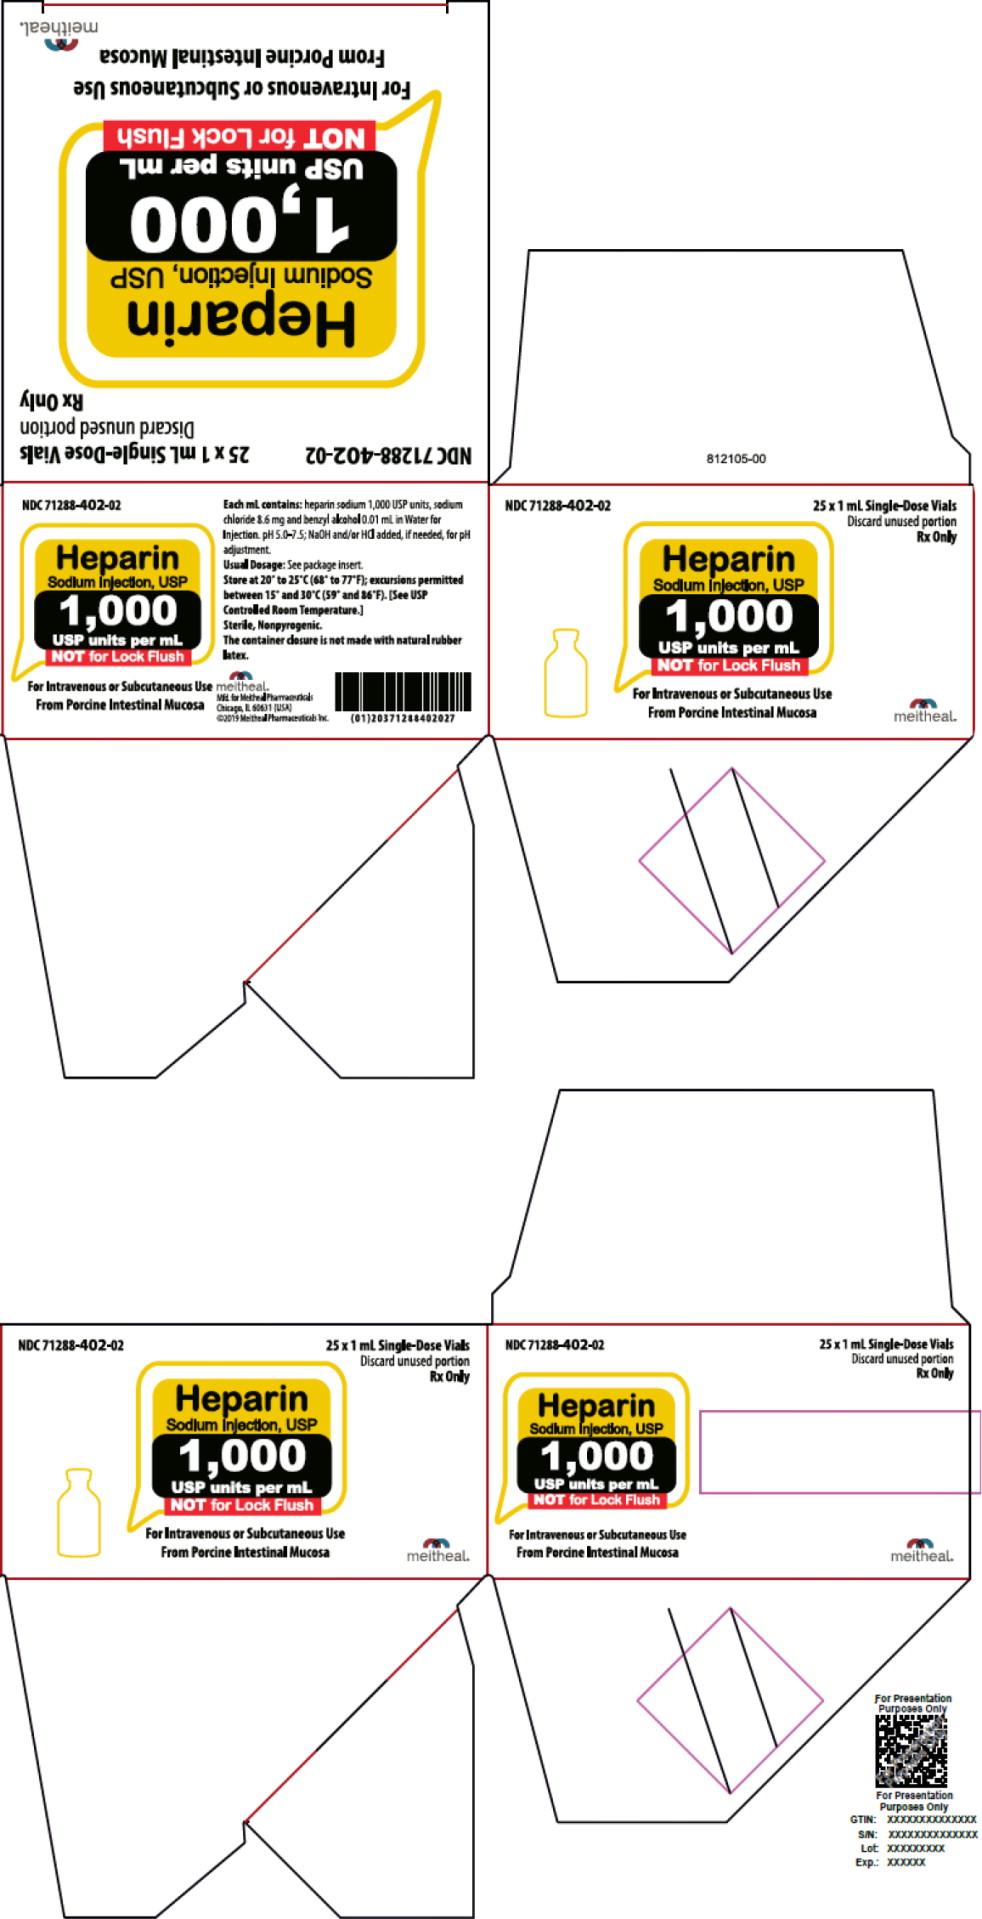 Principal Display Panel – Heparin Sodium Injection, USP 1,000 USP Carton